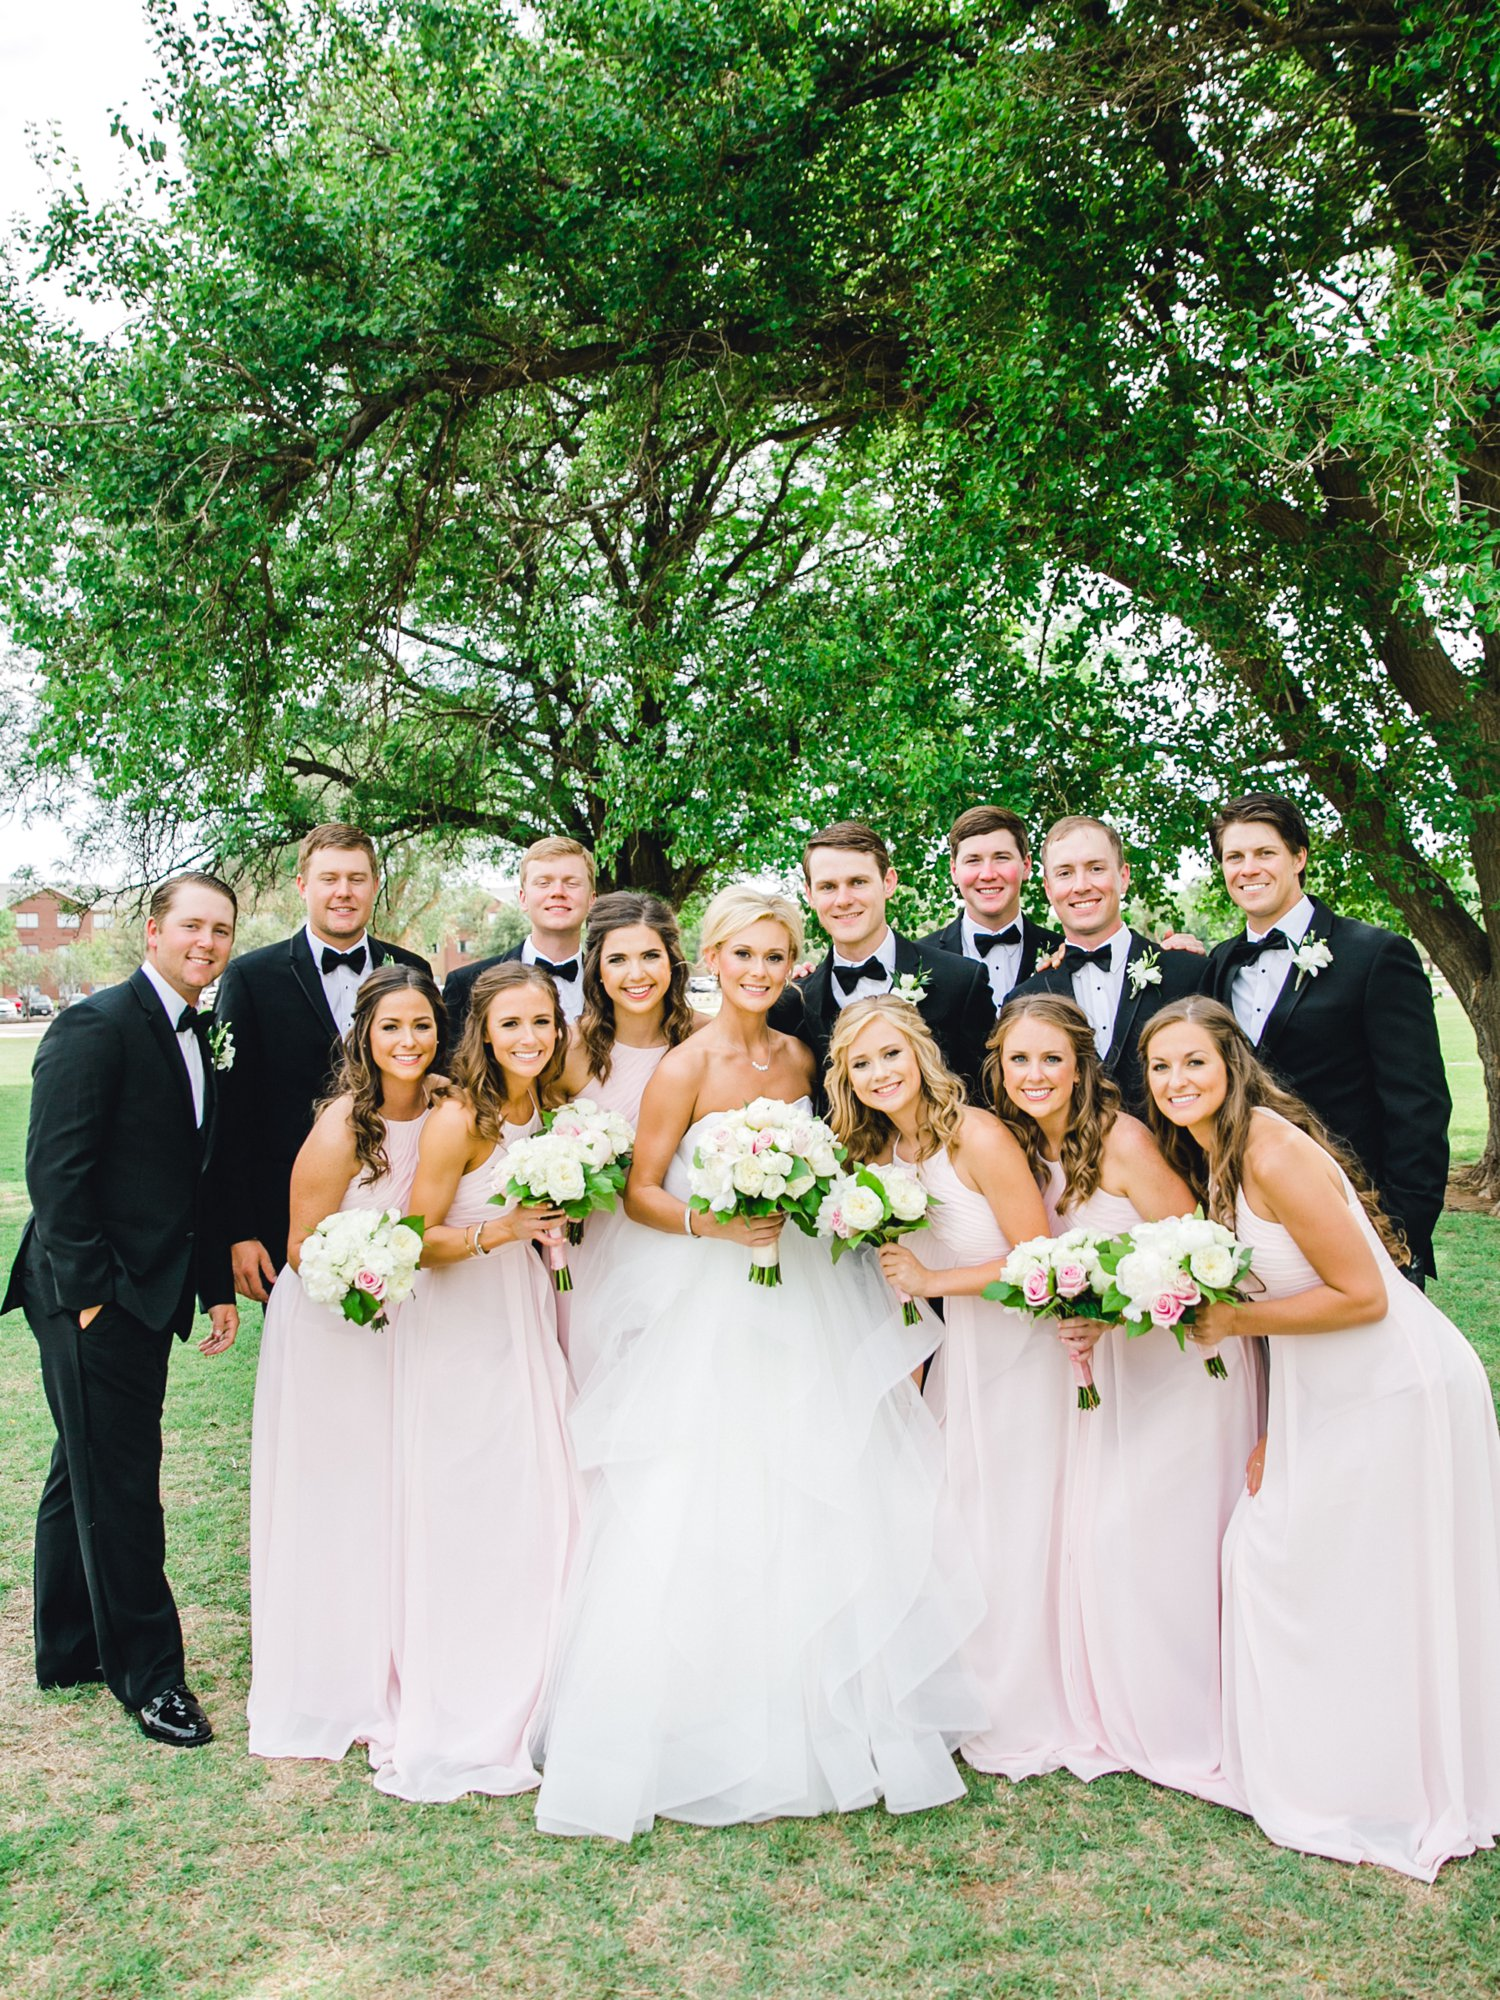 Taylor-and-Brock-Williams-Texas-Tech-University-Merket-Alumni-Center-Lubbock-Photographer-ALLEEJ0090.jpg